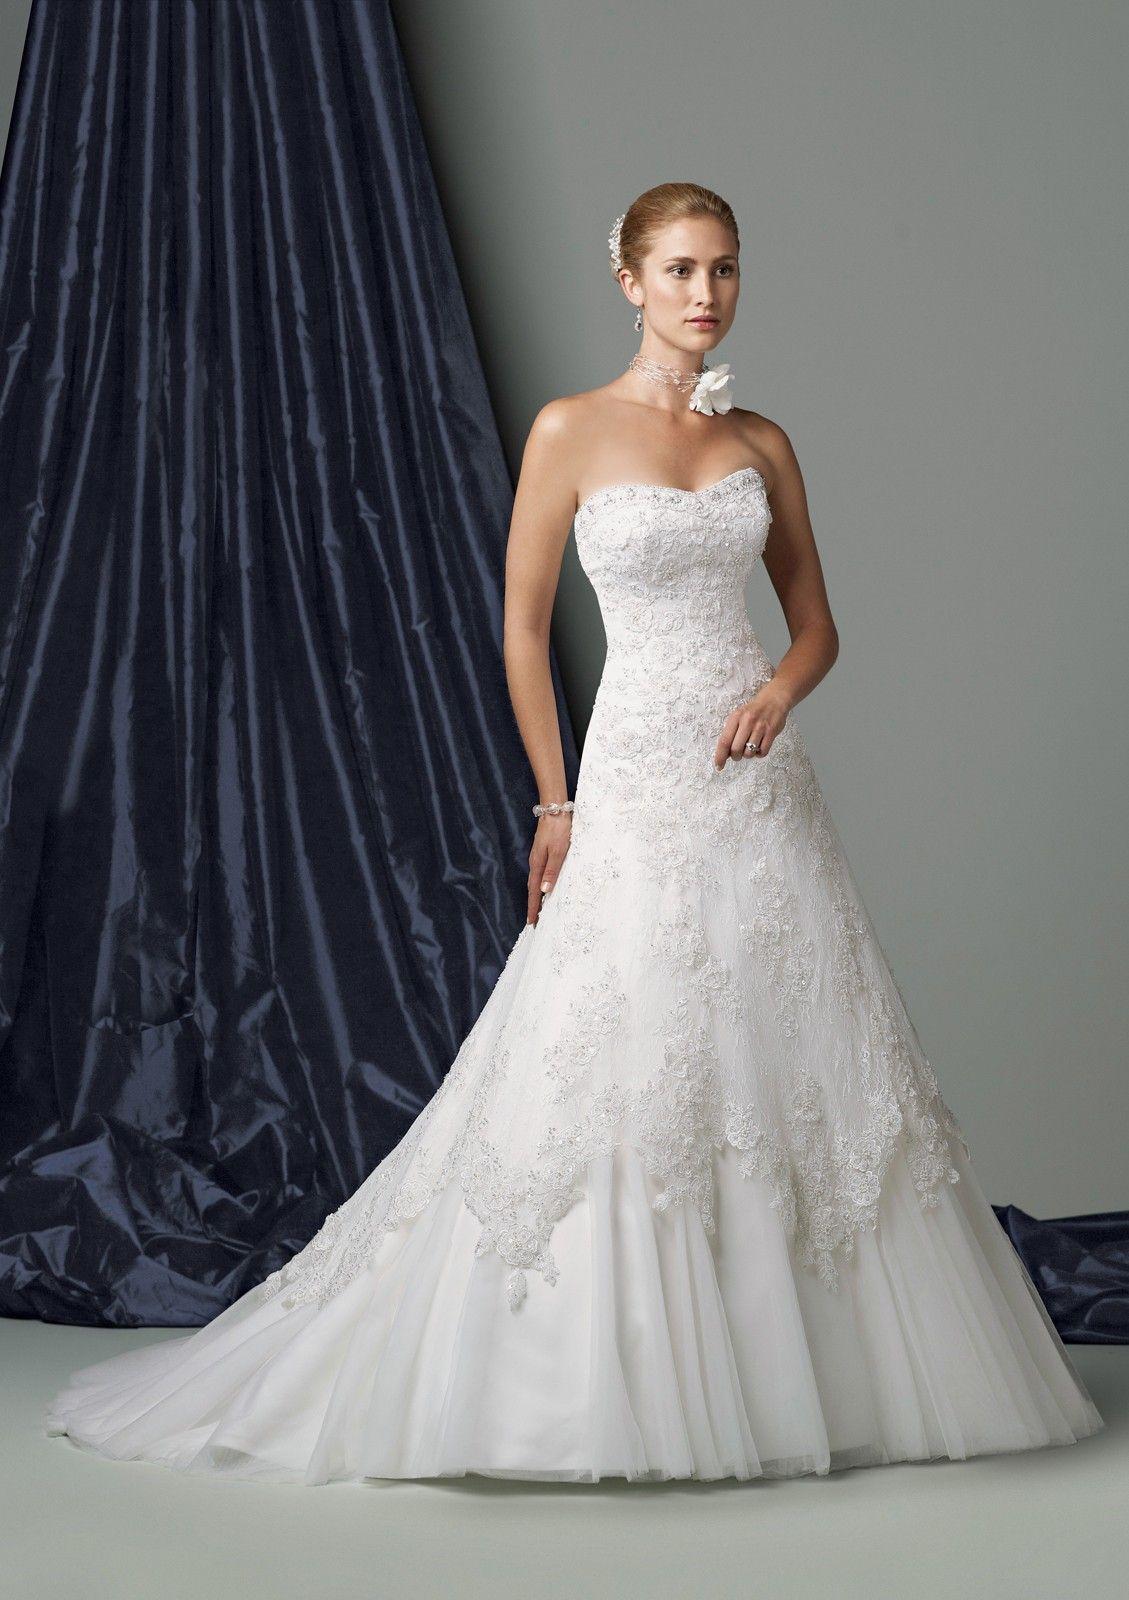 strapless lace wedding dress Strapless Wedding Dresses Are The Bride s 1 Dress Choice StyleKuw